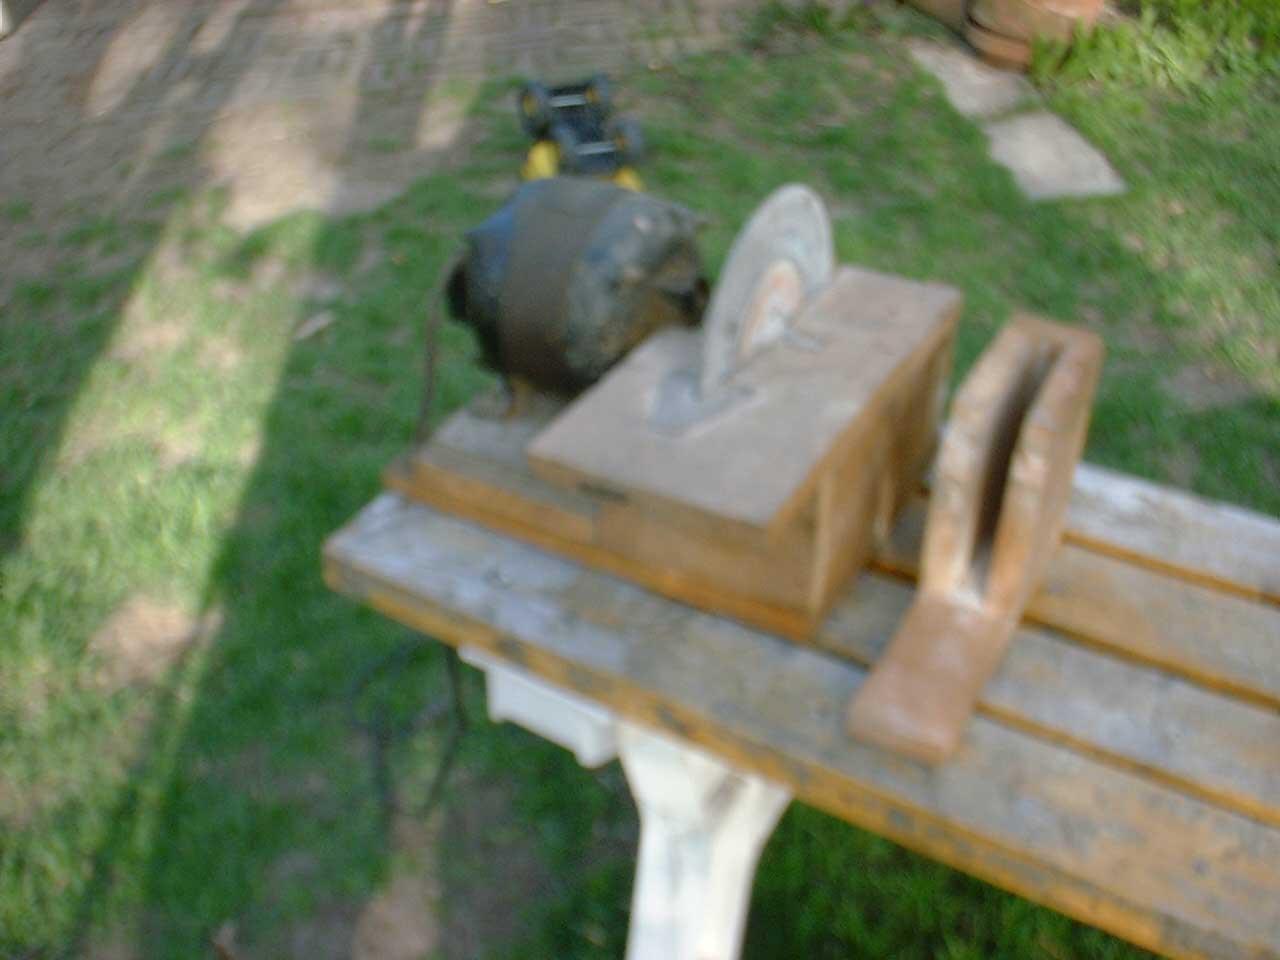 Kreigh S Homemade Lapidary Equipment